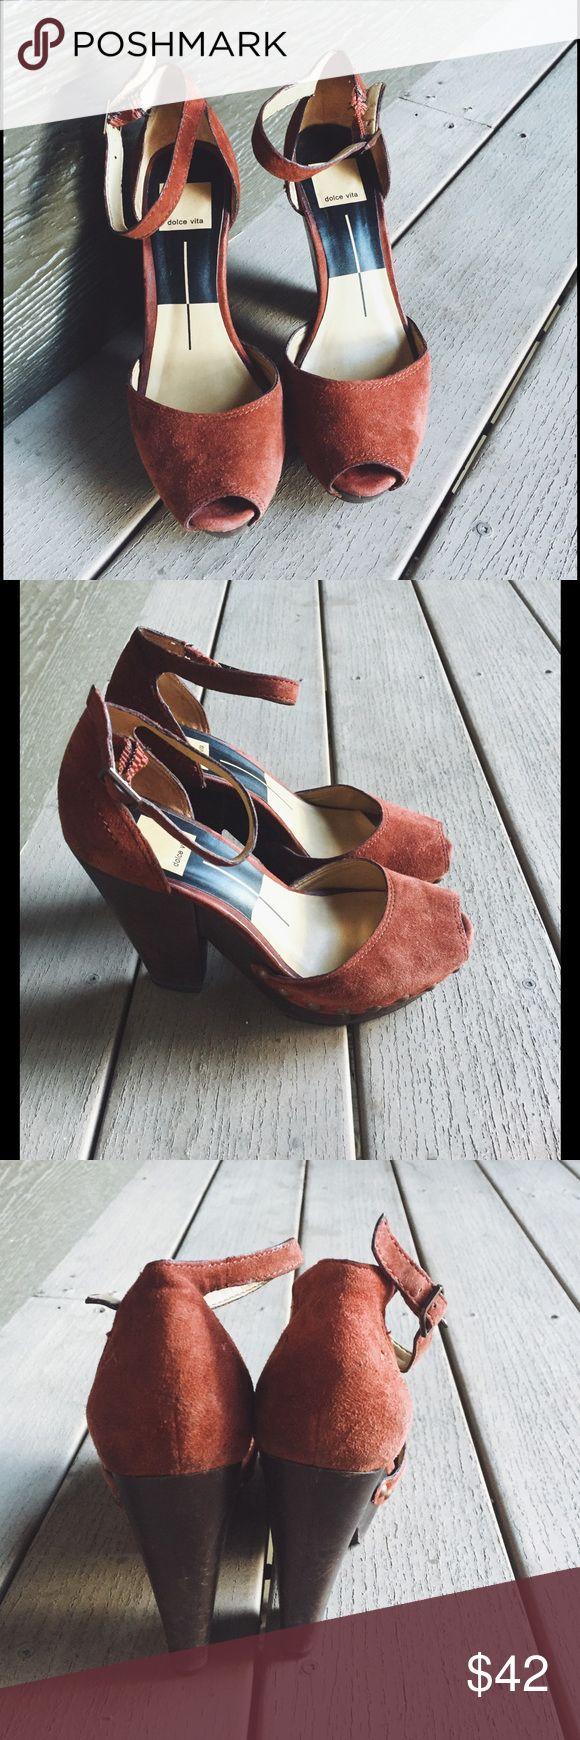 Selling this Dolce Vita Huxley suede rust wood platform heels on Poshmark! My username is: wanderlust83. #shopmycloset #poshmark #fashion #shopping #style #forsale #Dolce Vita #Shoes